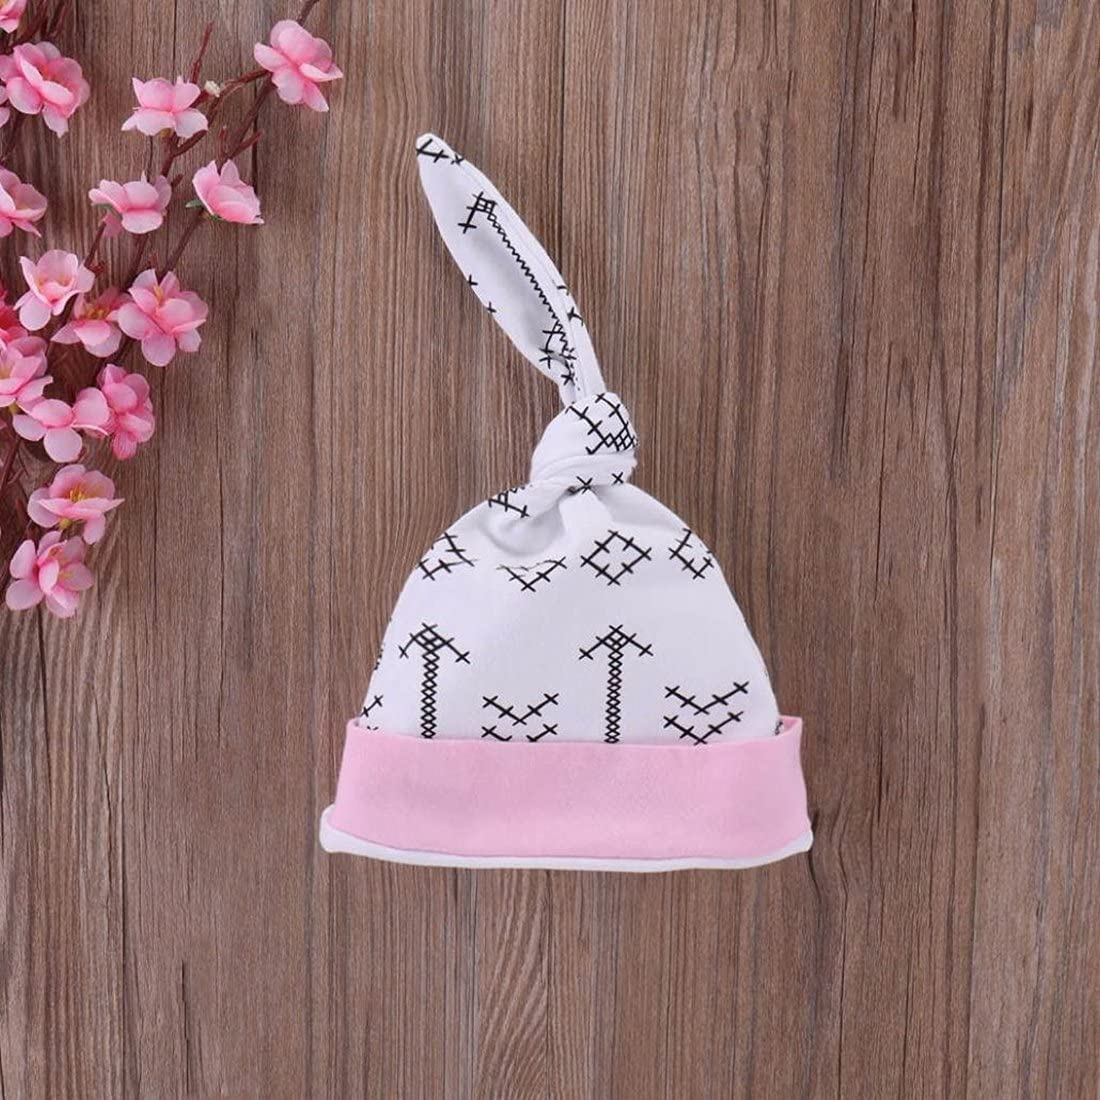 Headband GRNSHTS Baby Girls 4Pcs Outfits Letter Print Romper Arrow Pants Z Pink, 100//12-18 Months Hat